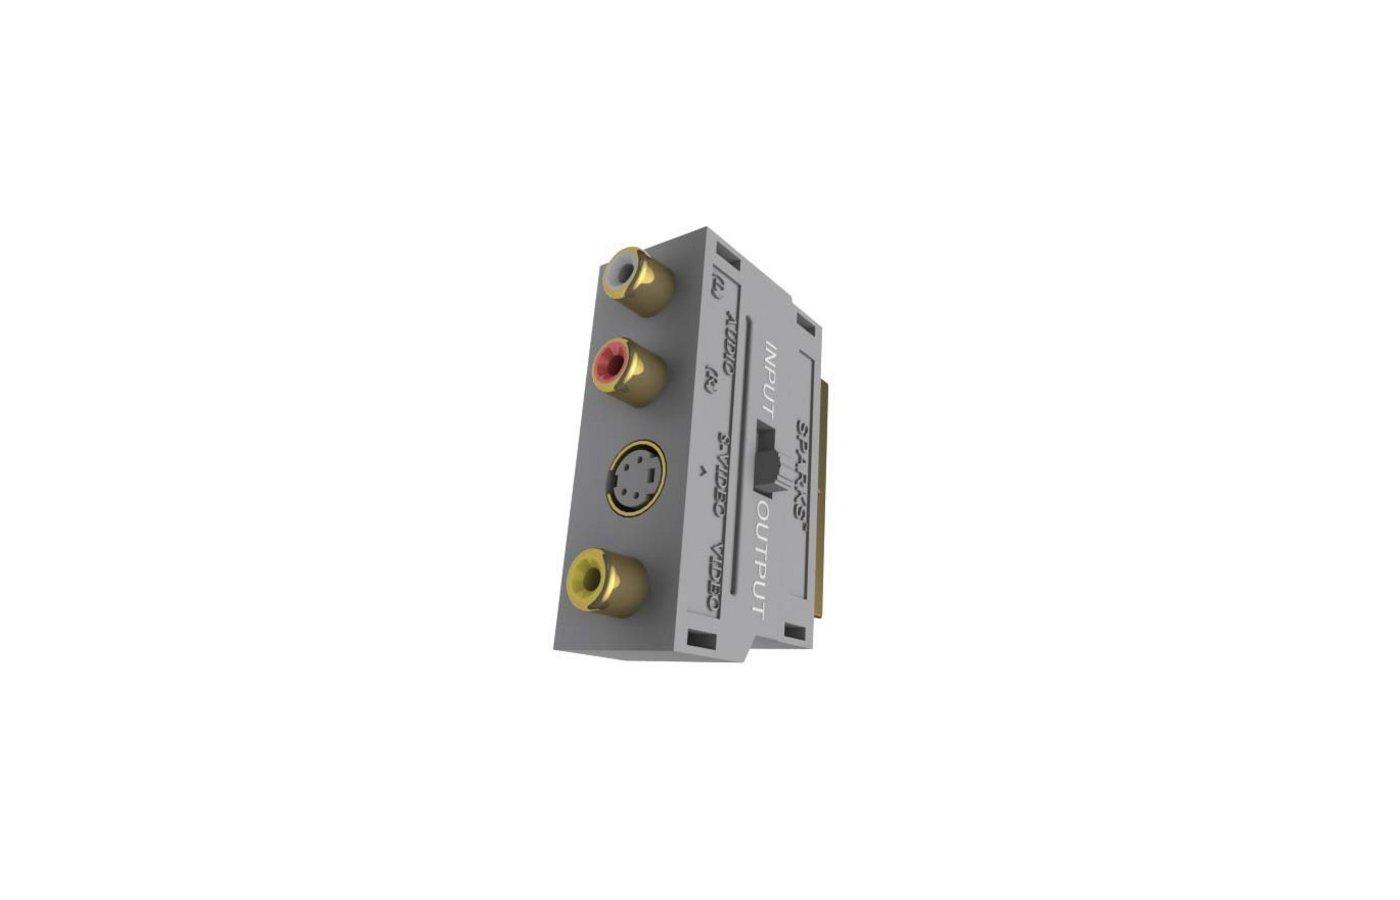 Переходник SPARKS SG 1102 SCART(m) - 3xRCA(f)